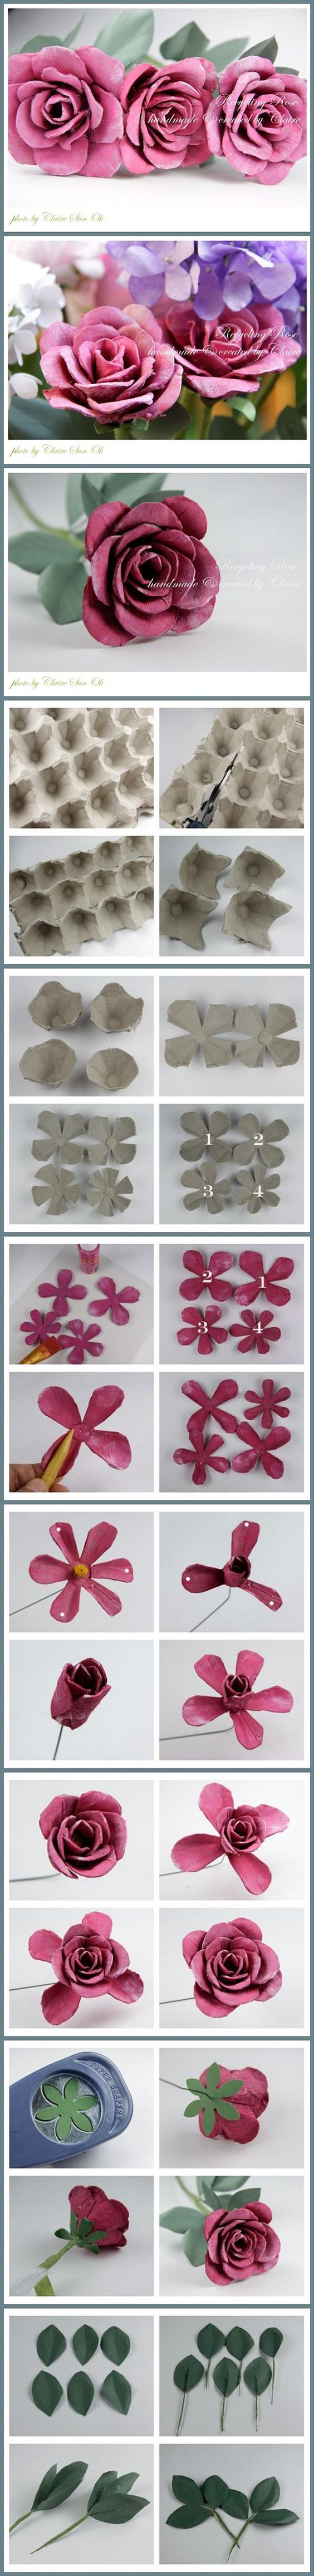 Best Of Pinterest Manualidades Artesanías De Flores Cartones De Huevos